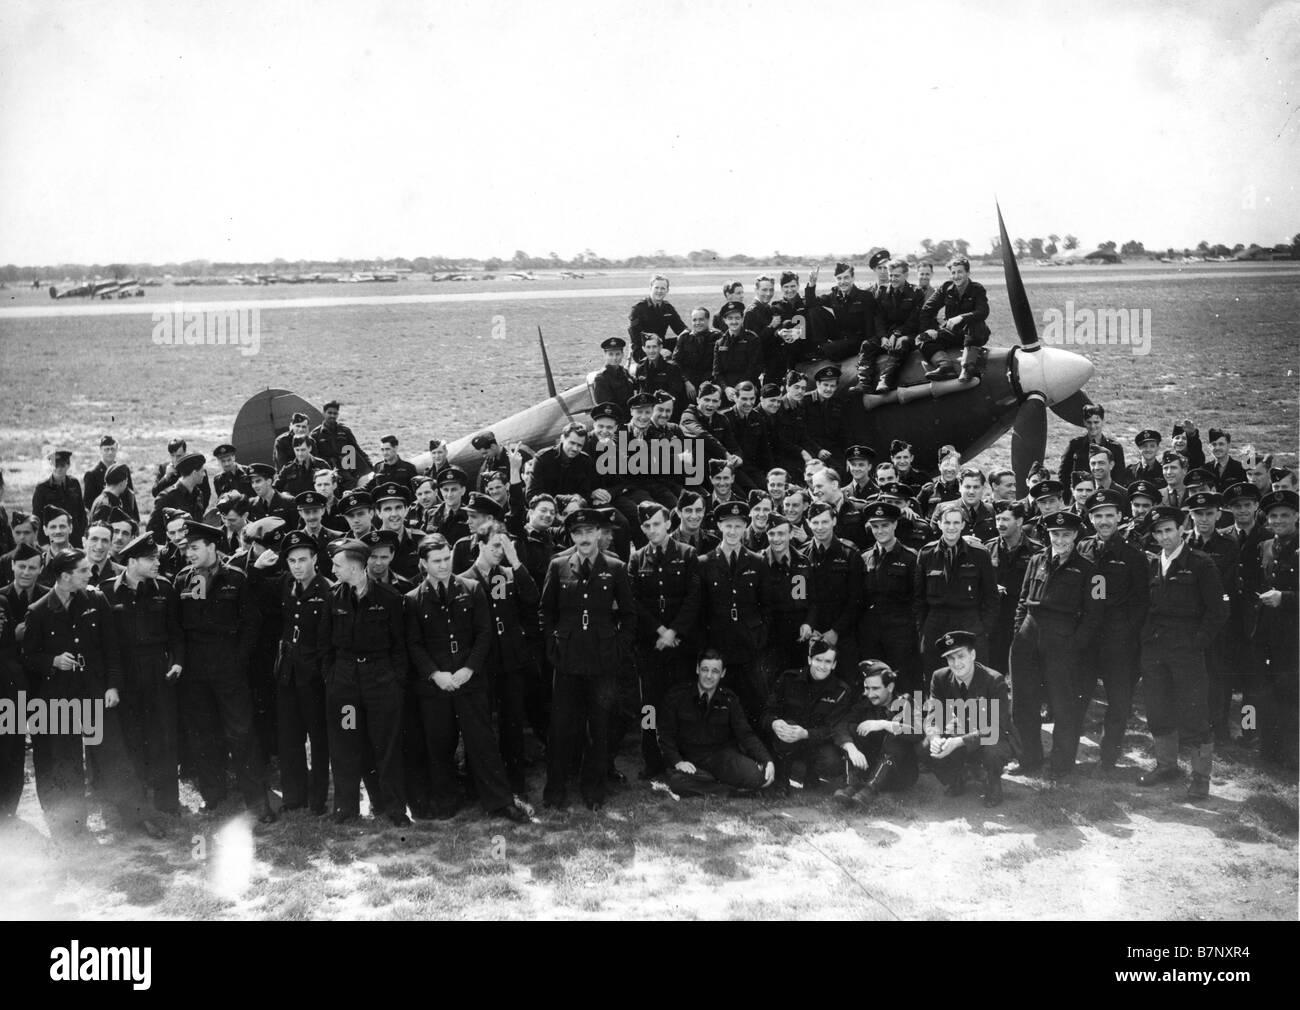 RAF HURRICANE SQUADRON  Unidentified  squadron about 1941 - Stock Image